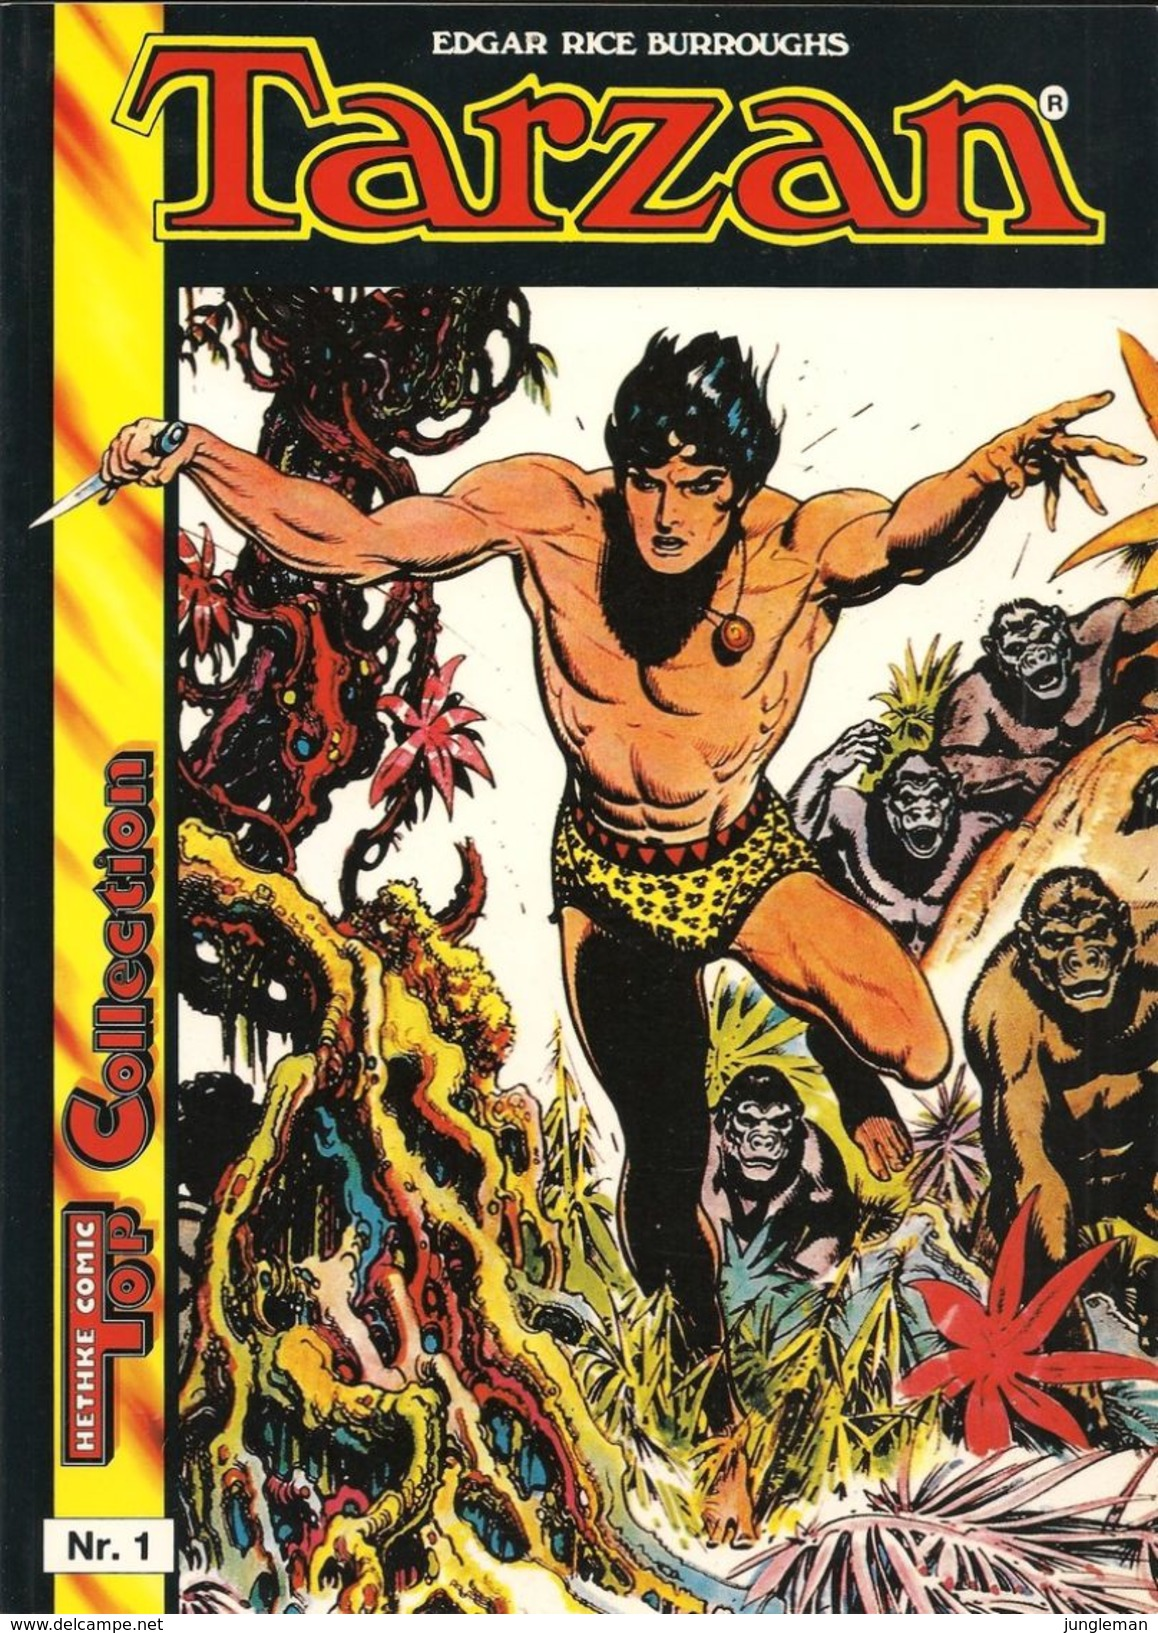 Tarzan N° 1 - Norbert Hethke Verlag - Top Collection - En Allemand - Burne Hogarth - TBE / Neuf. - Livres, BD, Revues